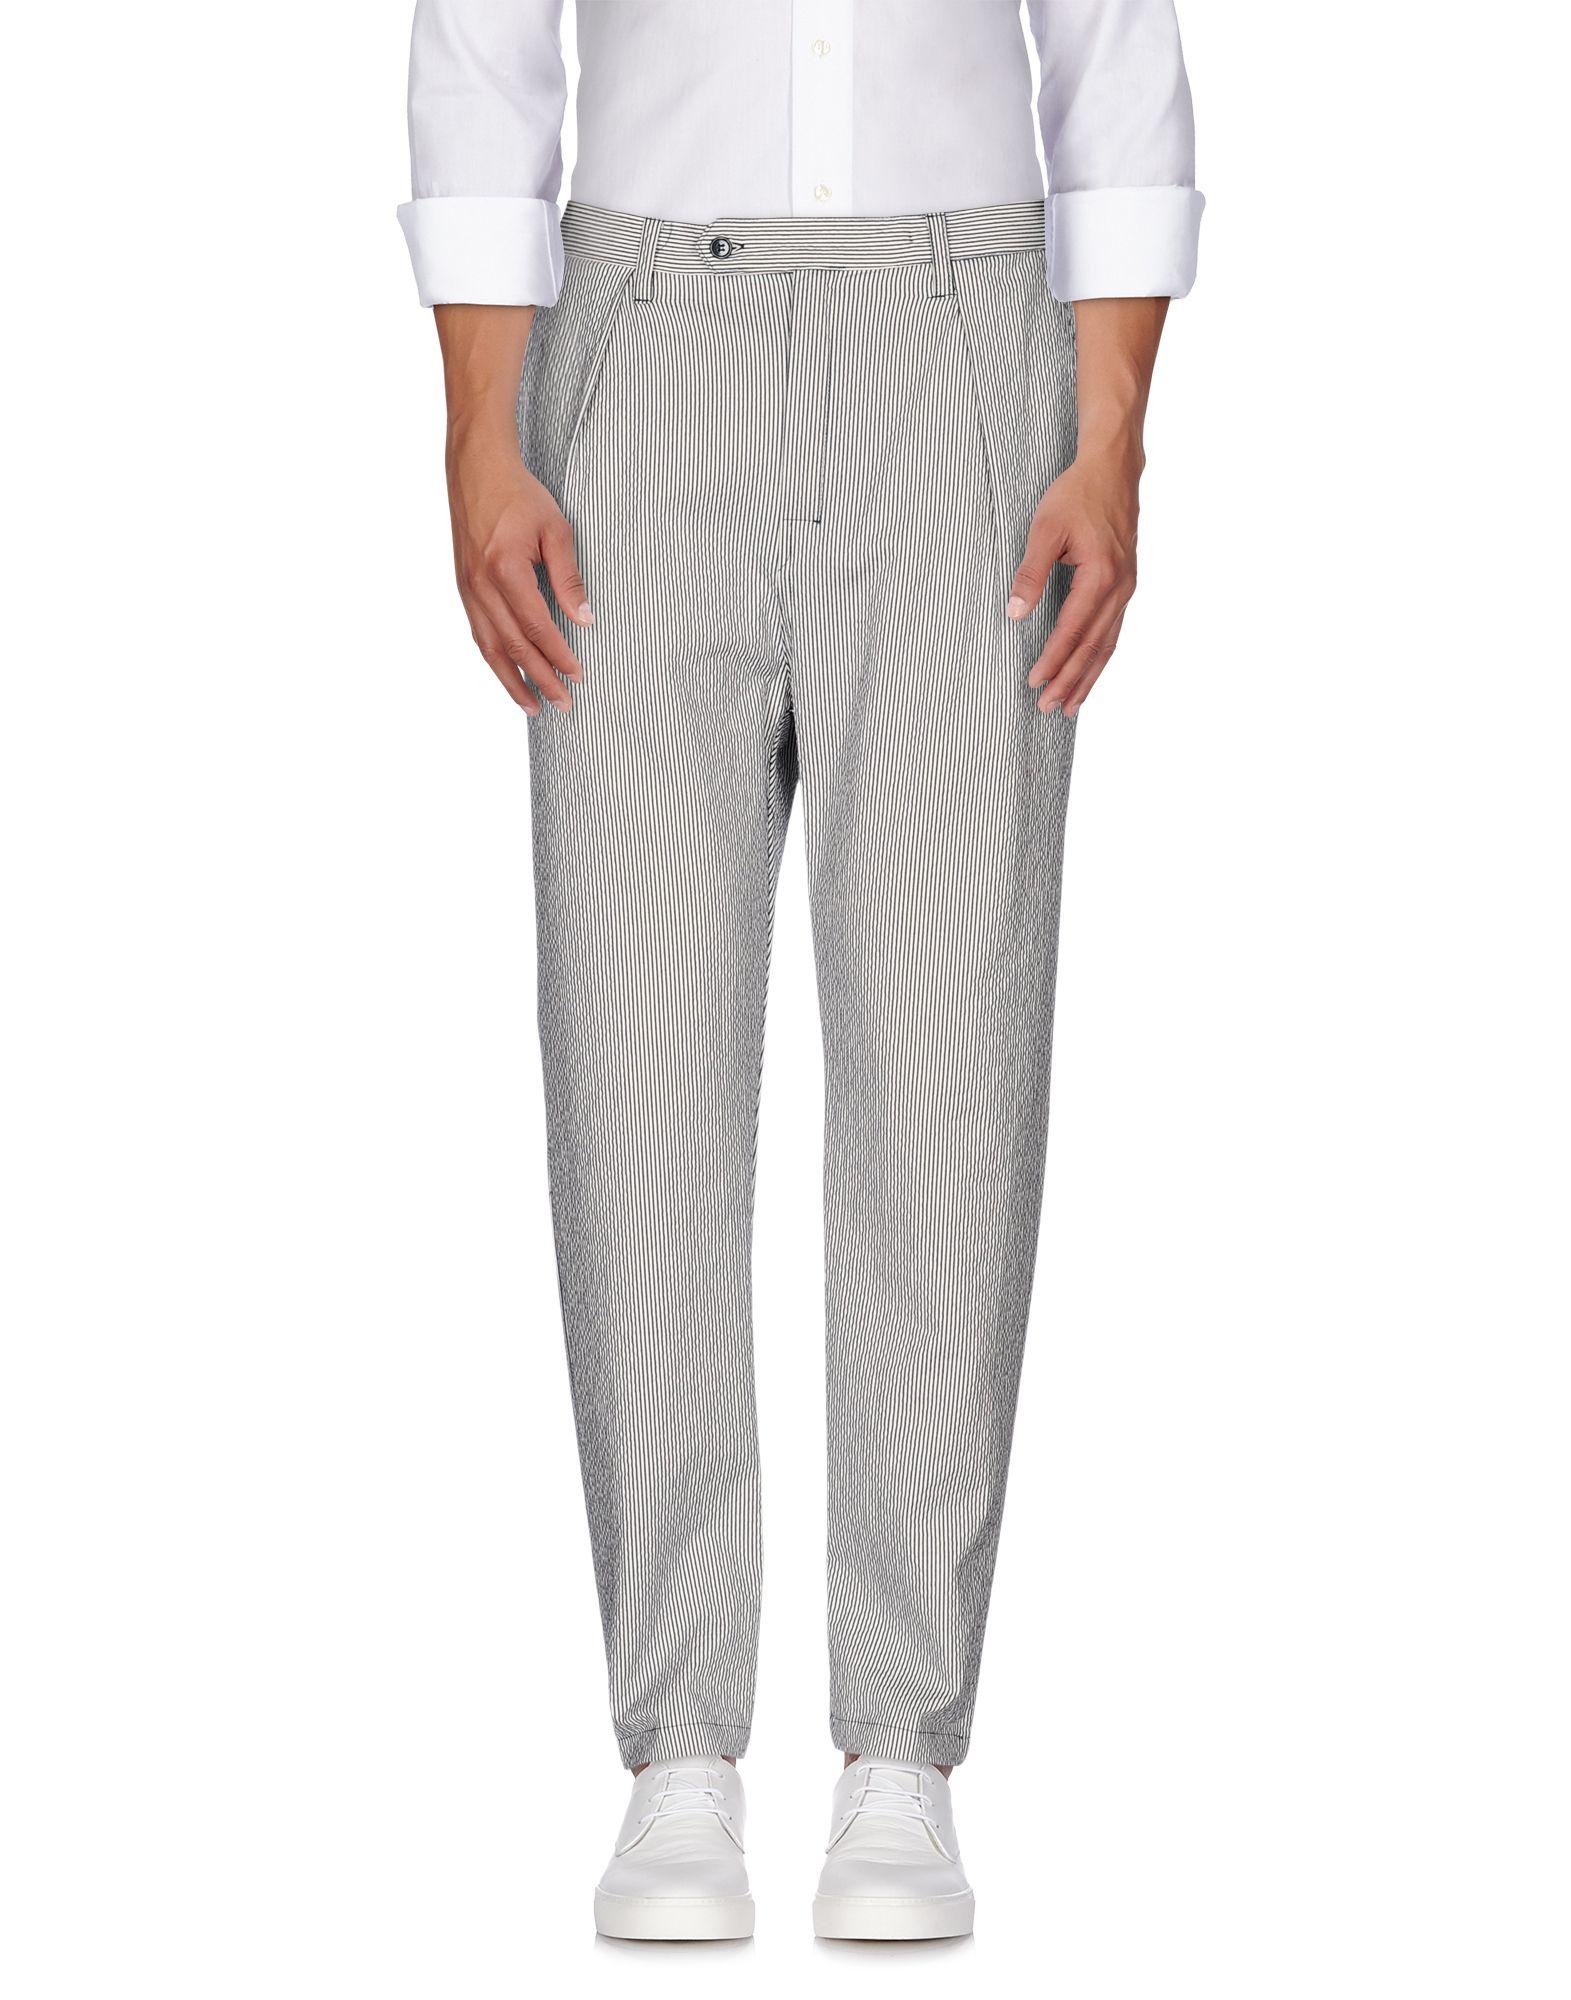 Cool Old Navy Women39s Camo Print Sweatpants Blue Camouflage Sweat Pants